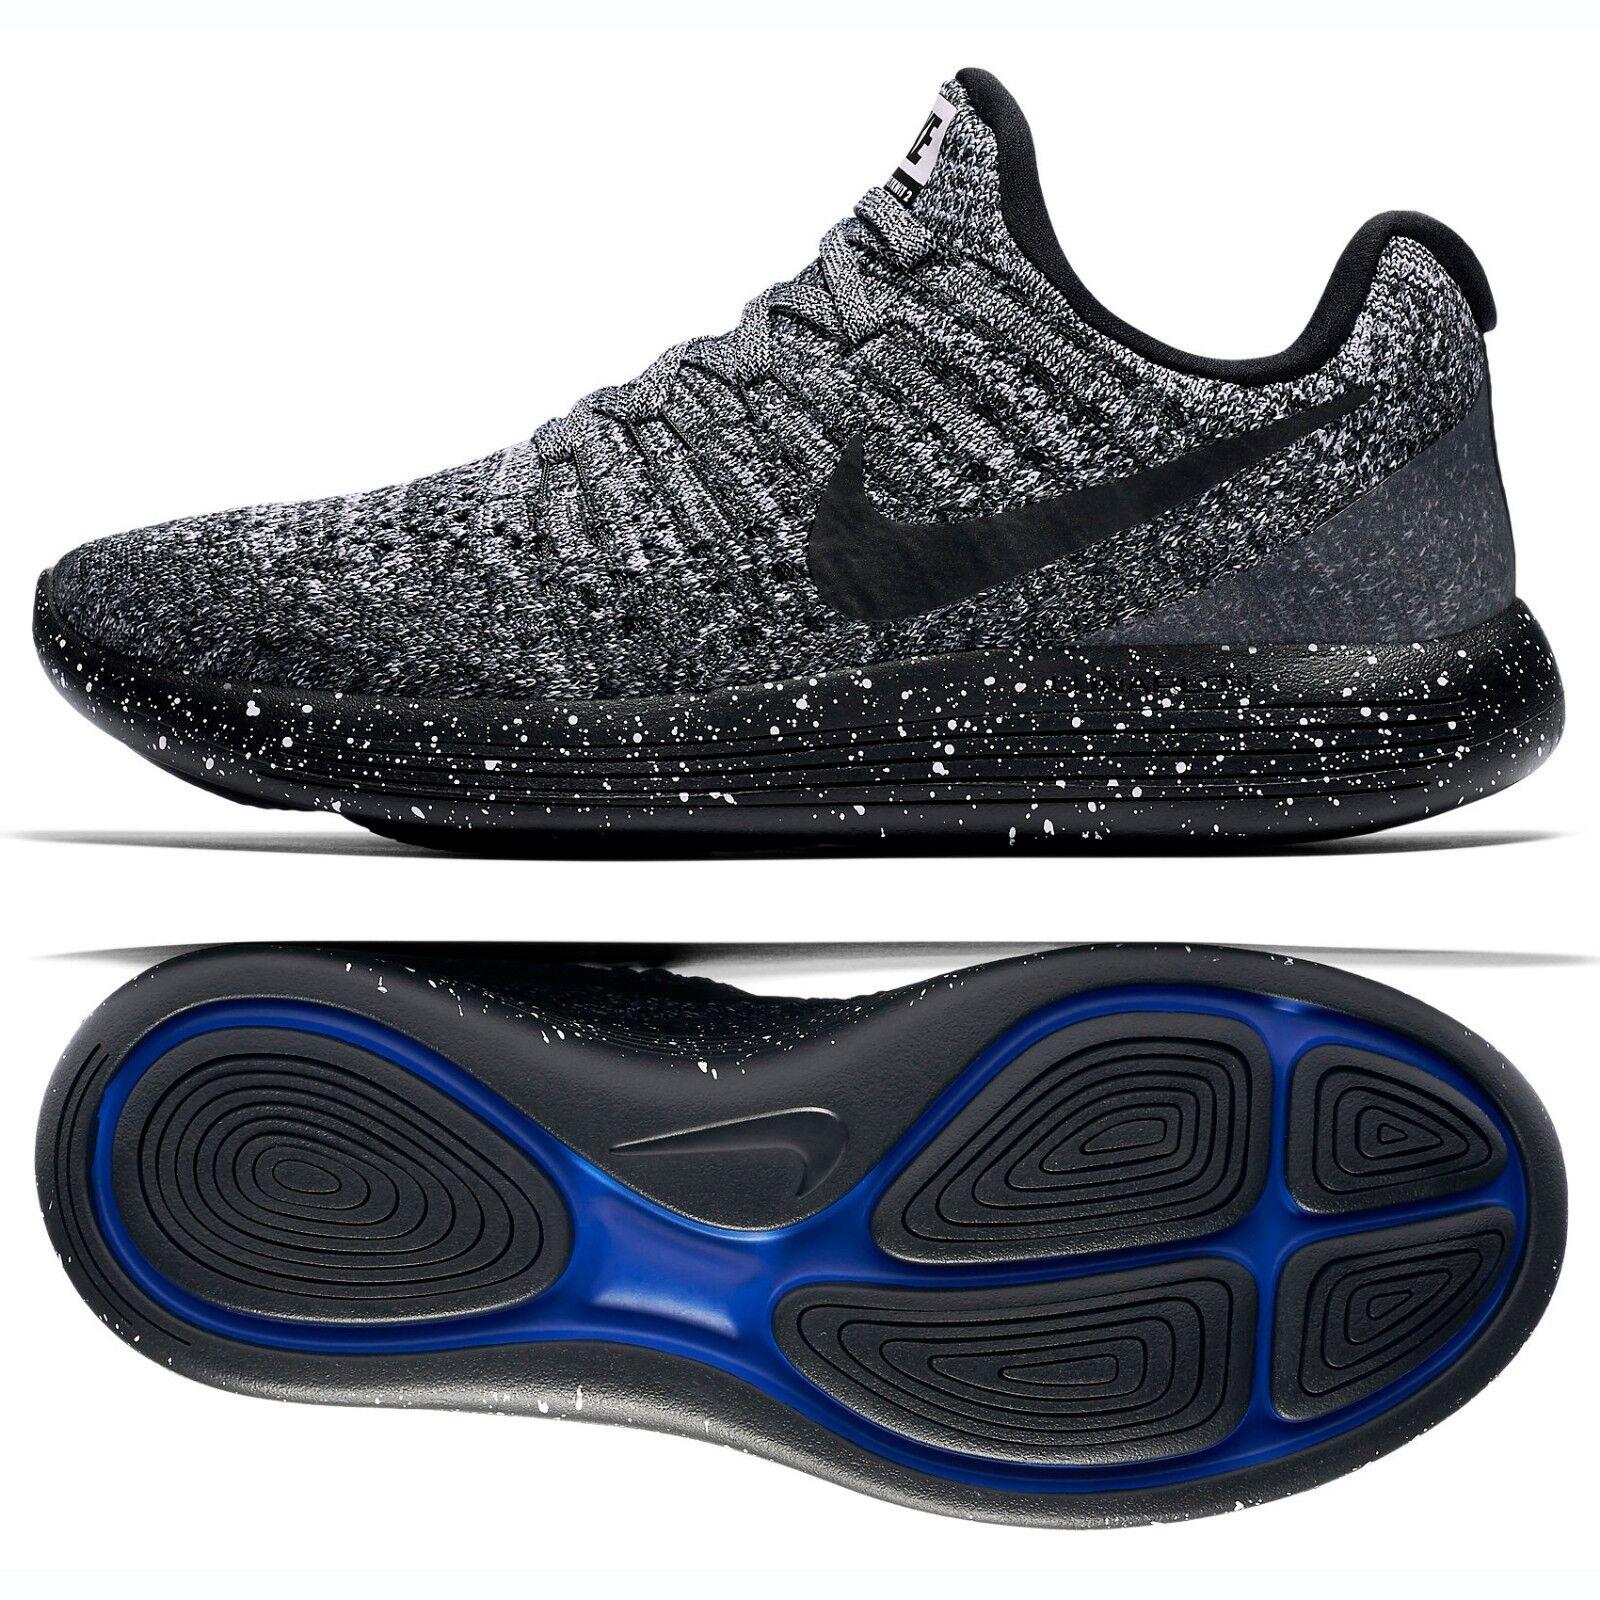 Nike W W W LunarEpic Low Flyknit 2 nero Racer blu 863780-041 Donna  Running scarpe 513656